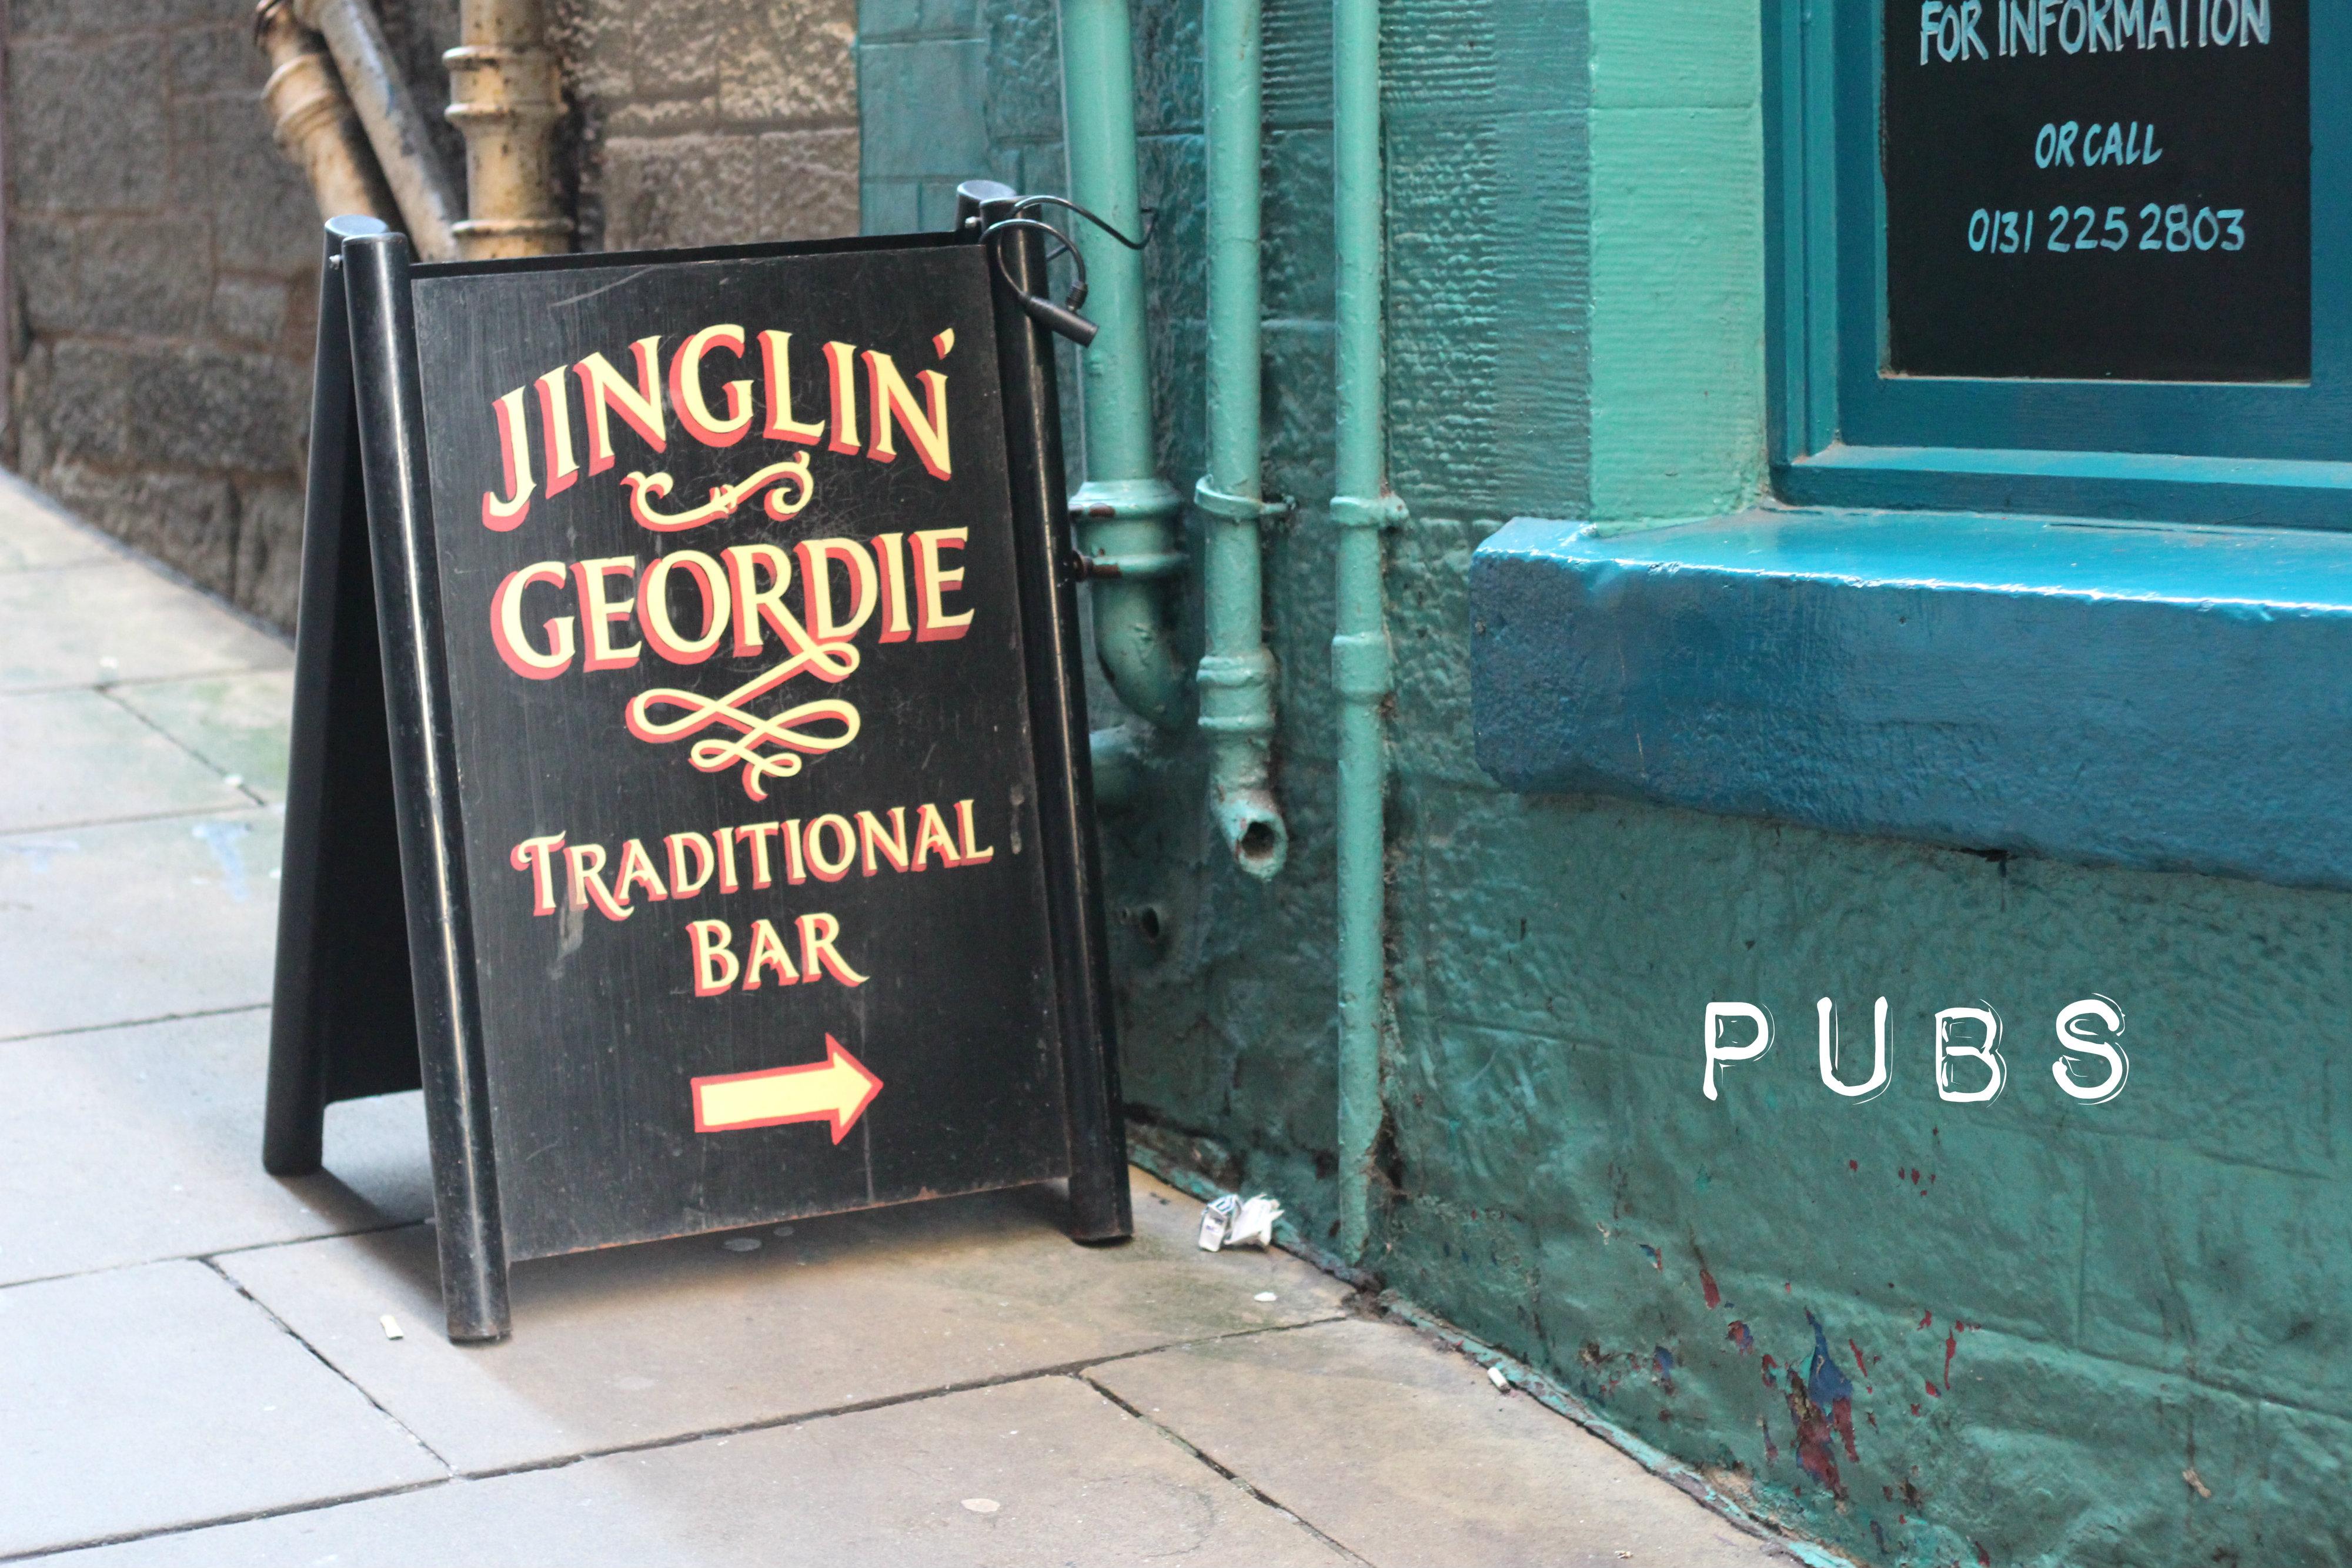 pubs.jpg